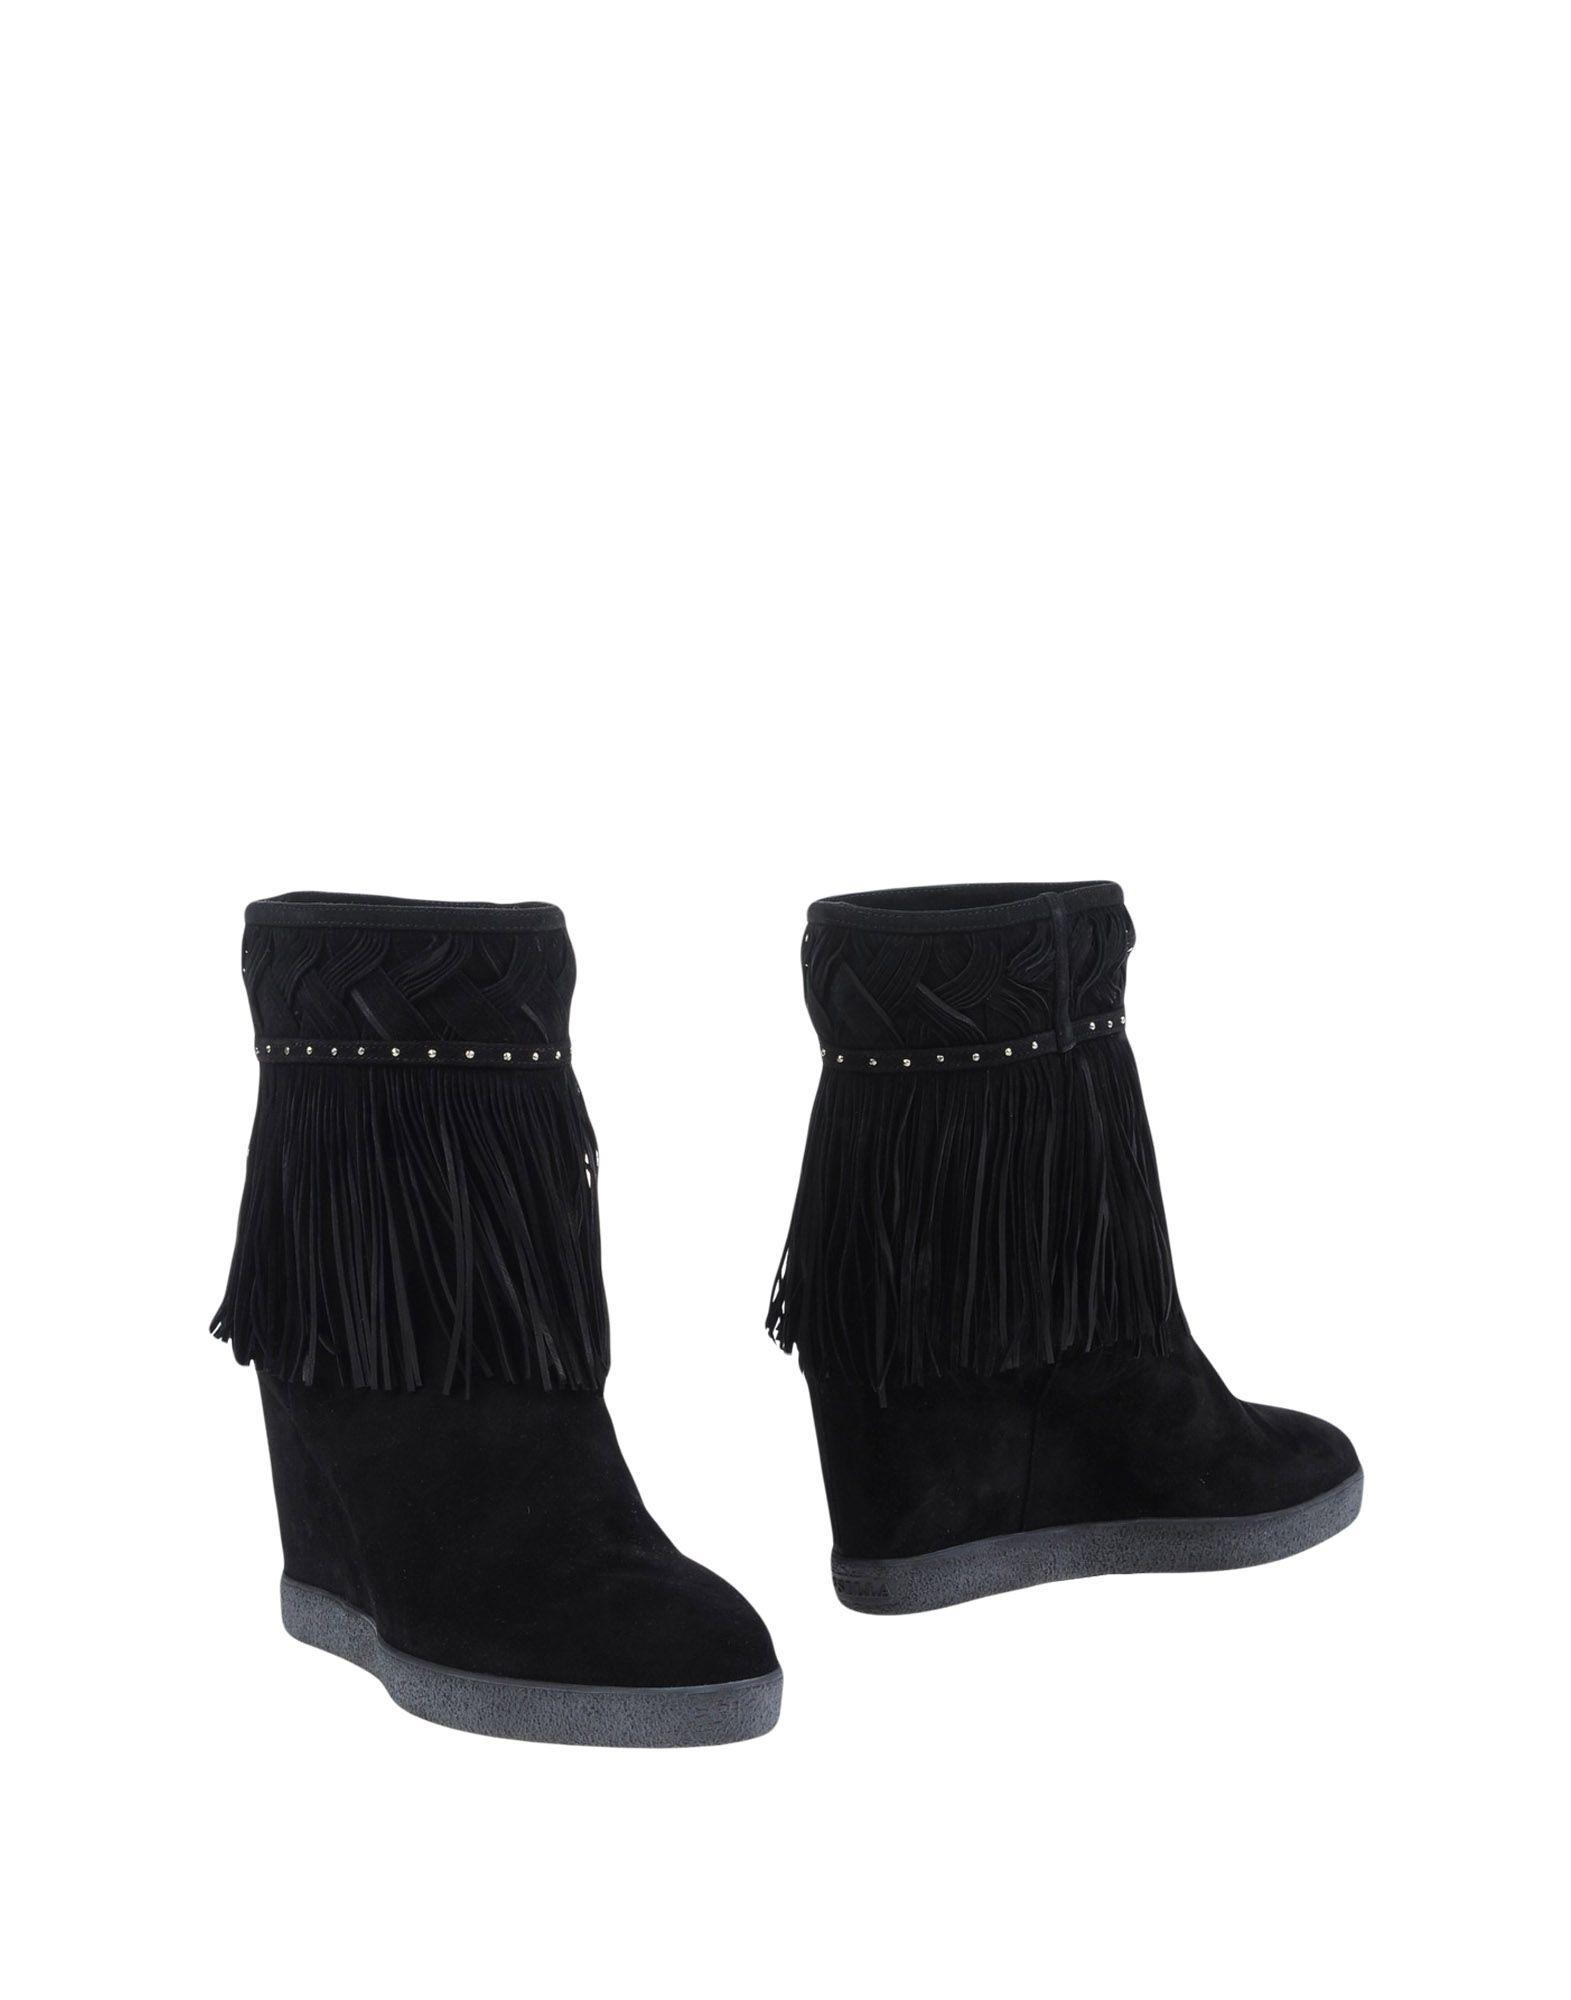 Le Silla Stiefelette Damen  11074352RE Beliebte Schuhe